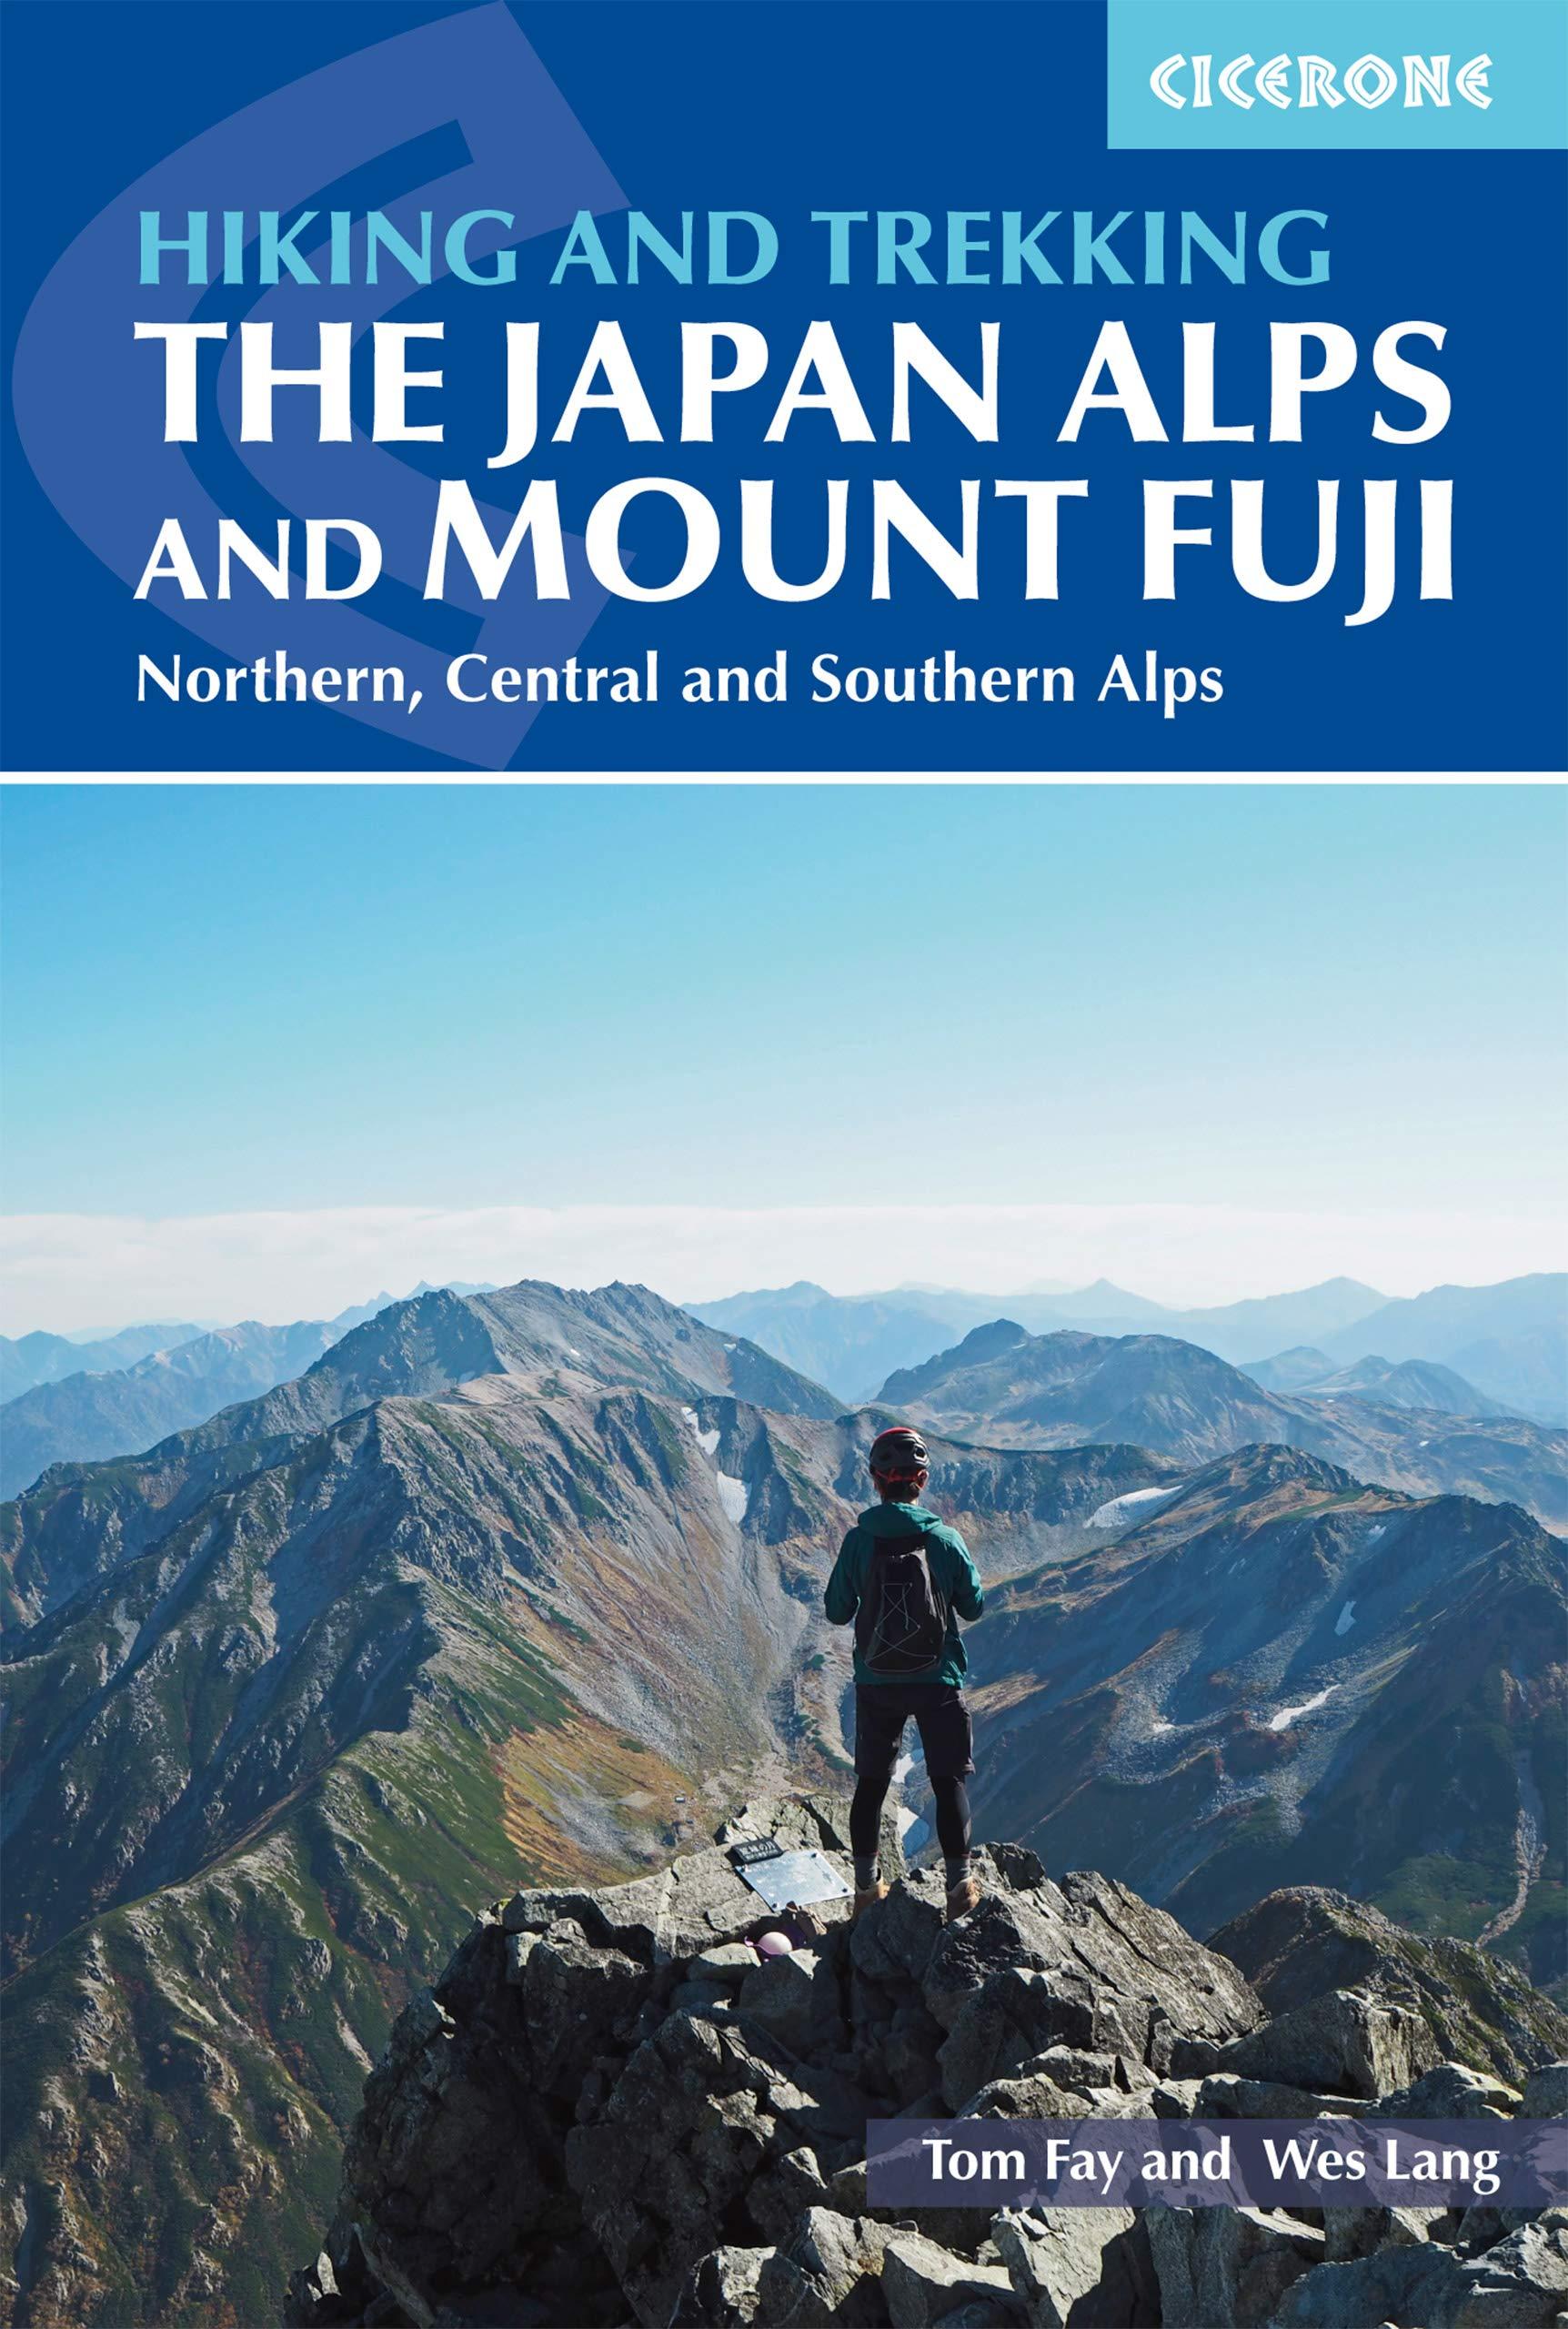 Walking And Trekking In The Japan Alps And Mount Fuji  Hakuba Tateyama Kamikochi And Kawaguchiko  Cicerone Walking And Trekking Guides